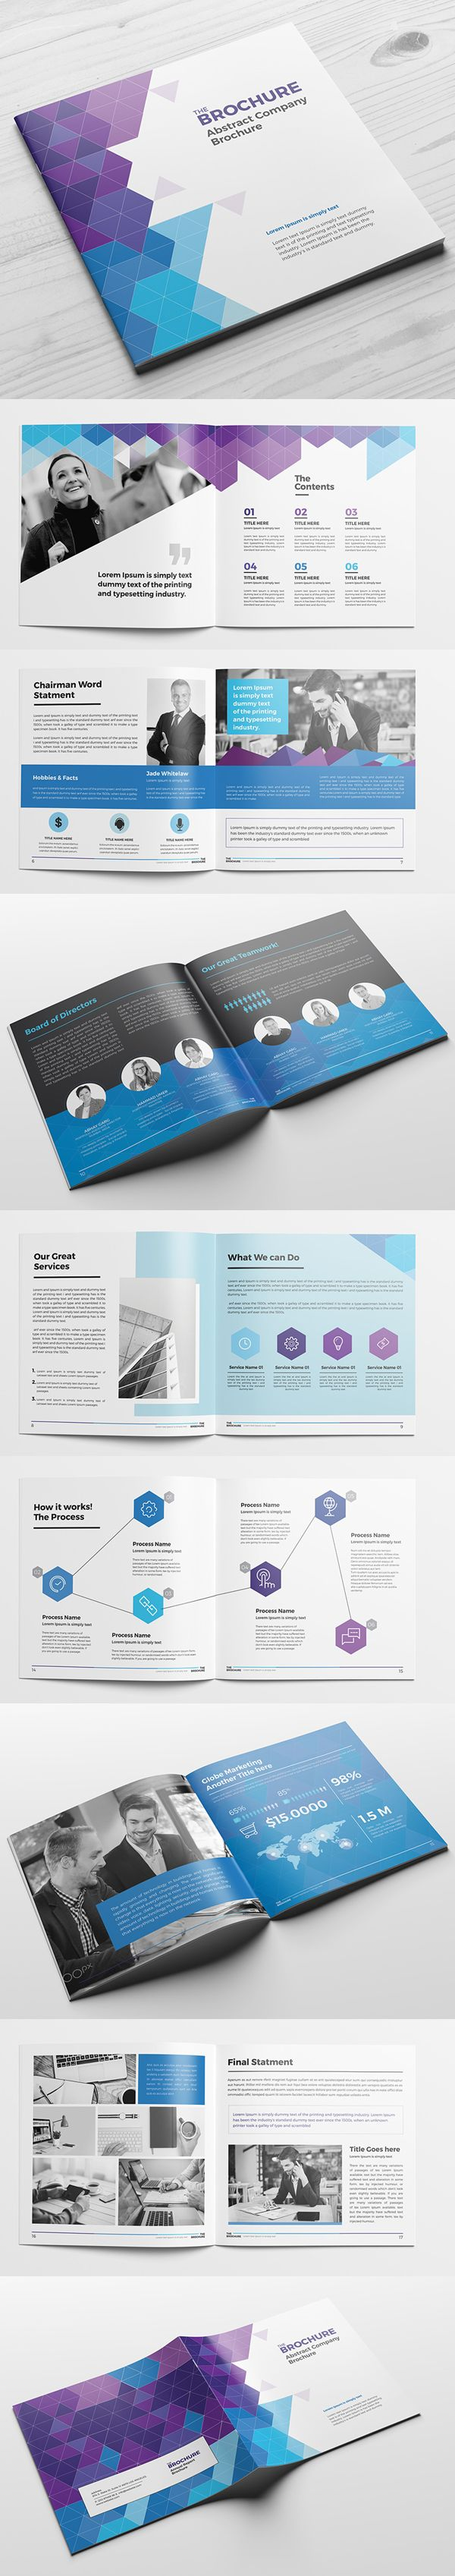 Creative Abstract Square Brochure Template #annualreport #booklet #brochuredesign #brochuretemplates #fashioncatalog #portfolio